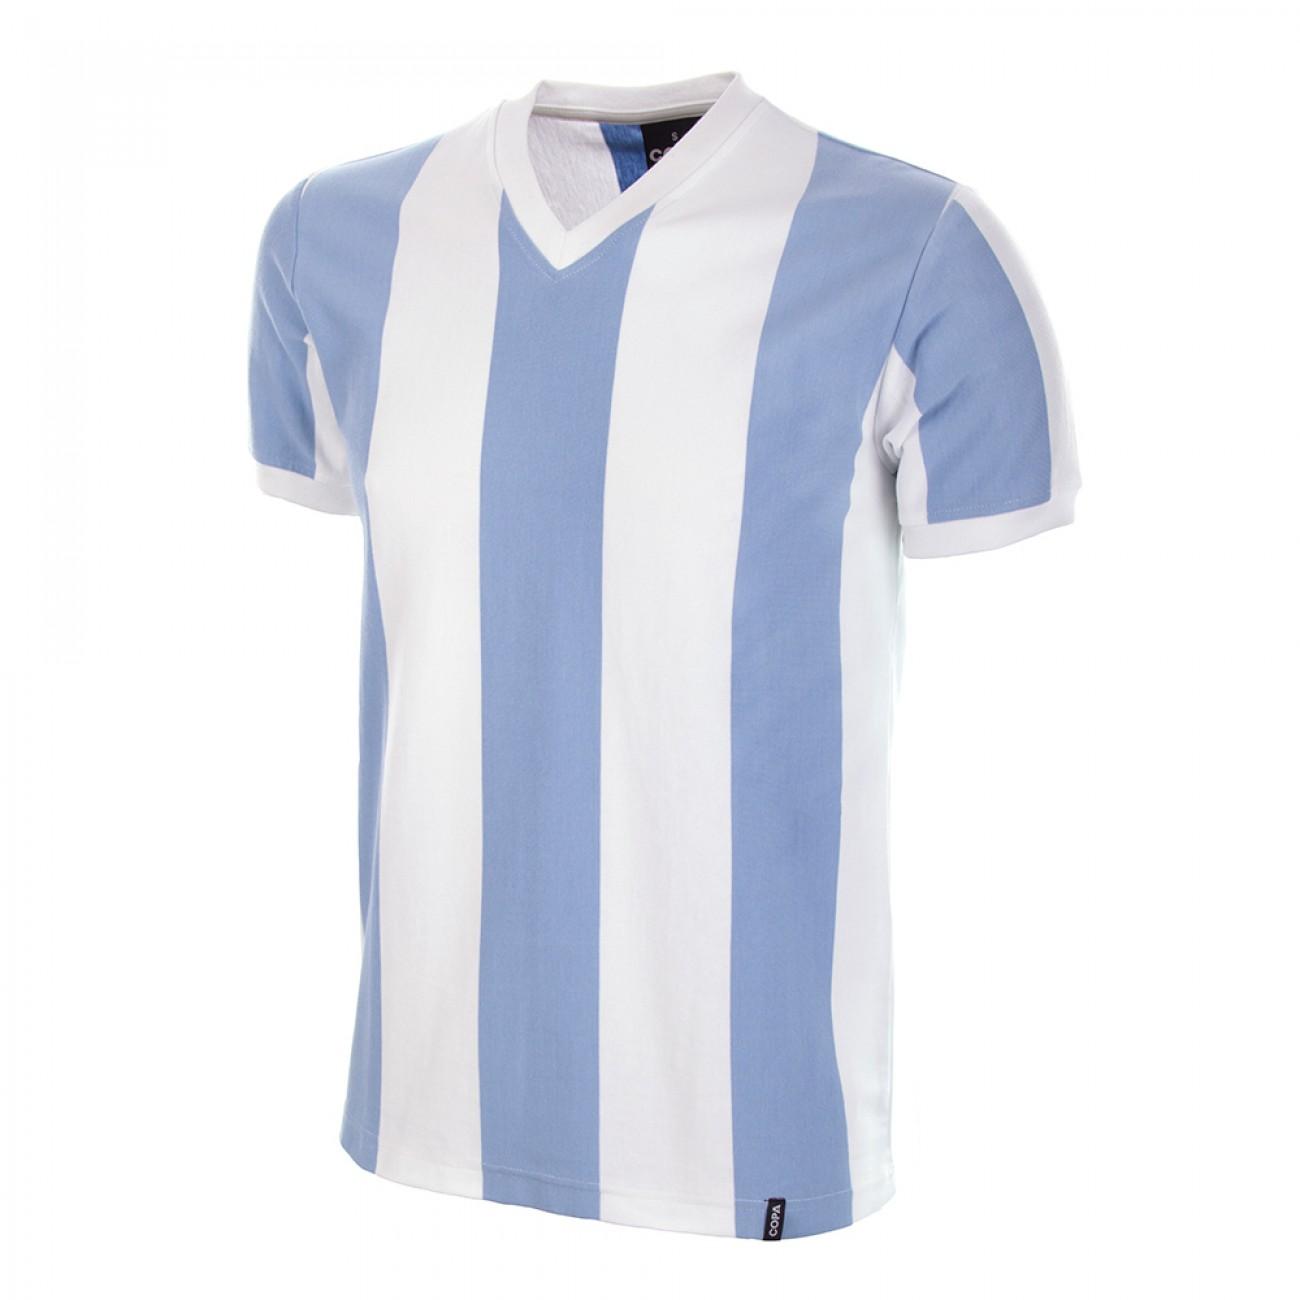 http://www.retrofootball.es/ropa-de-futbol/camiseta-argentina-a-os-60.html